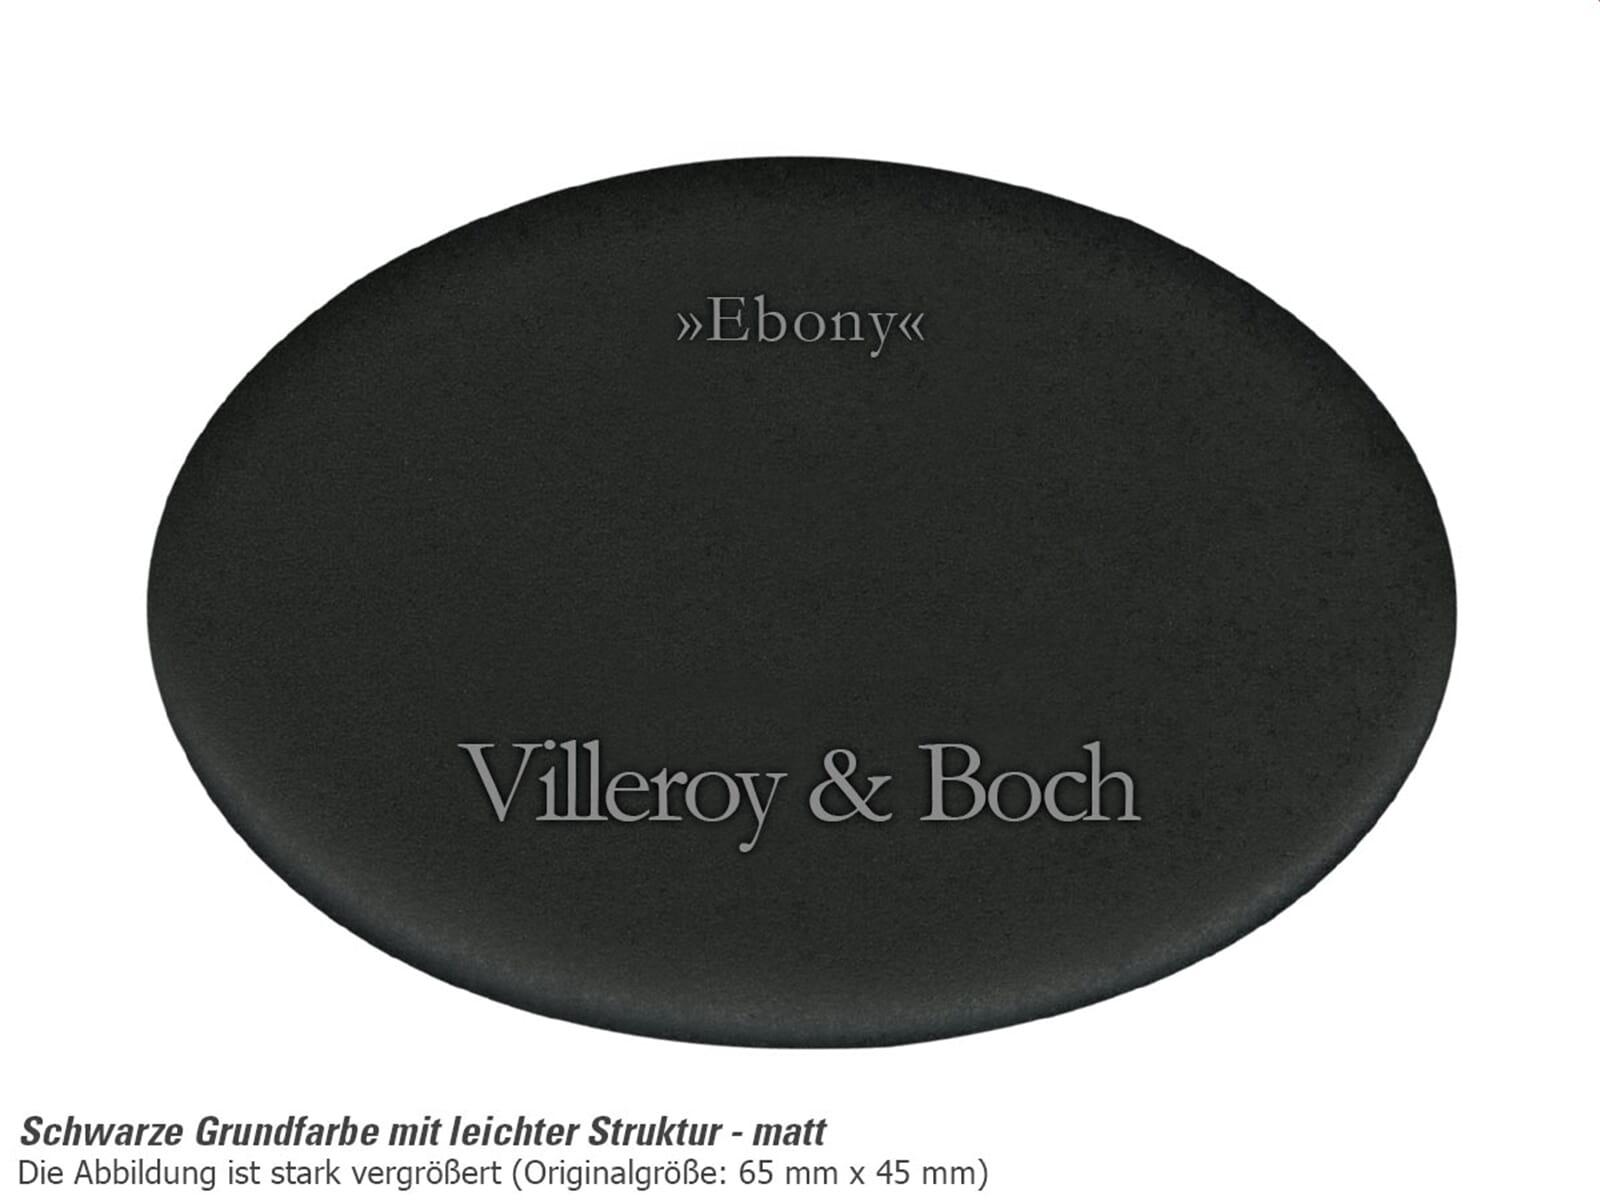 Villeroy & Boch Siluet 50 S Ebony – 3345 02 S5 Keramikspüle Exzenterbetätigung